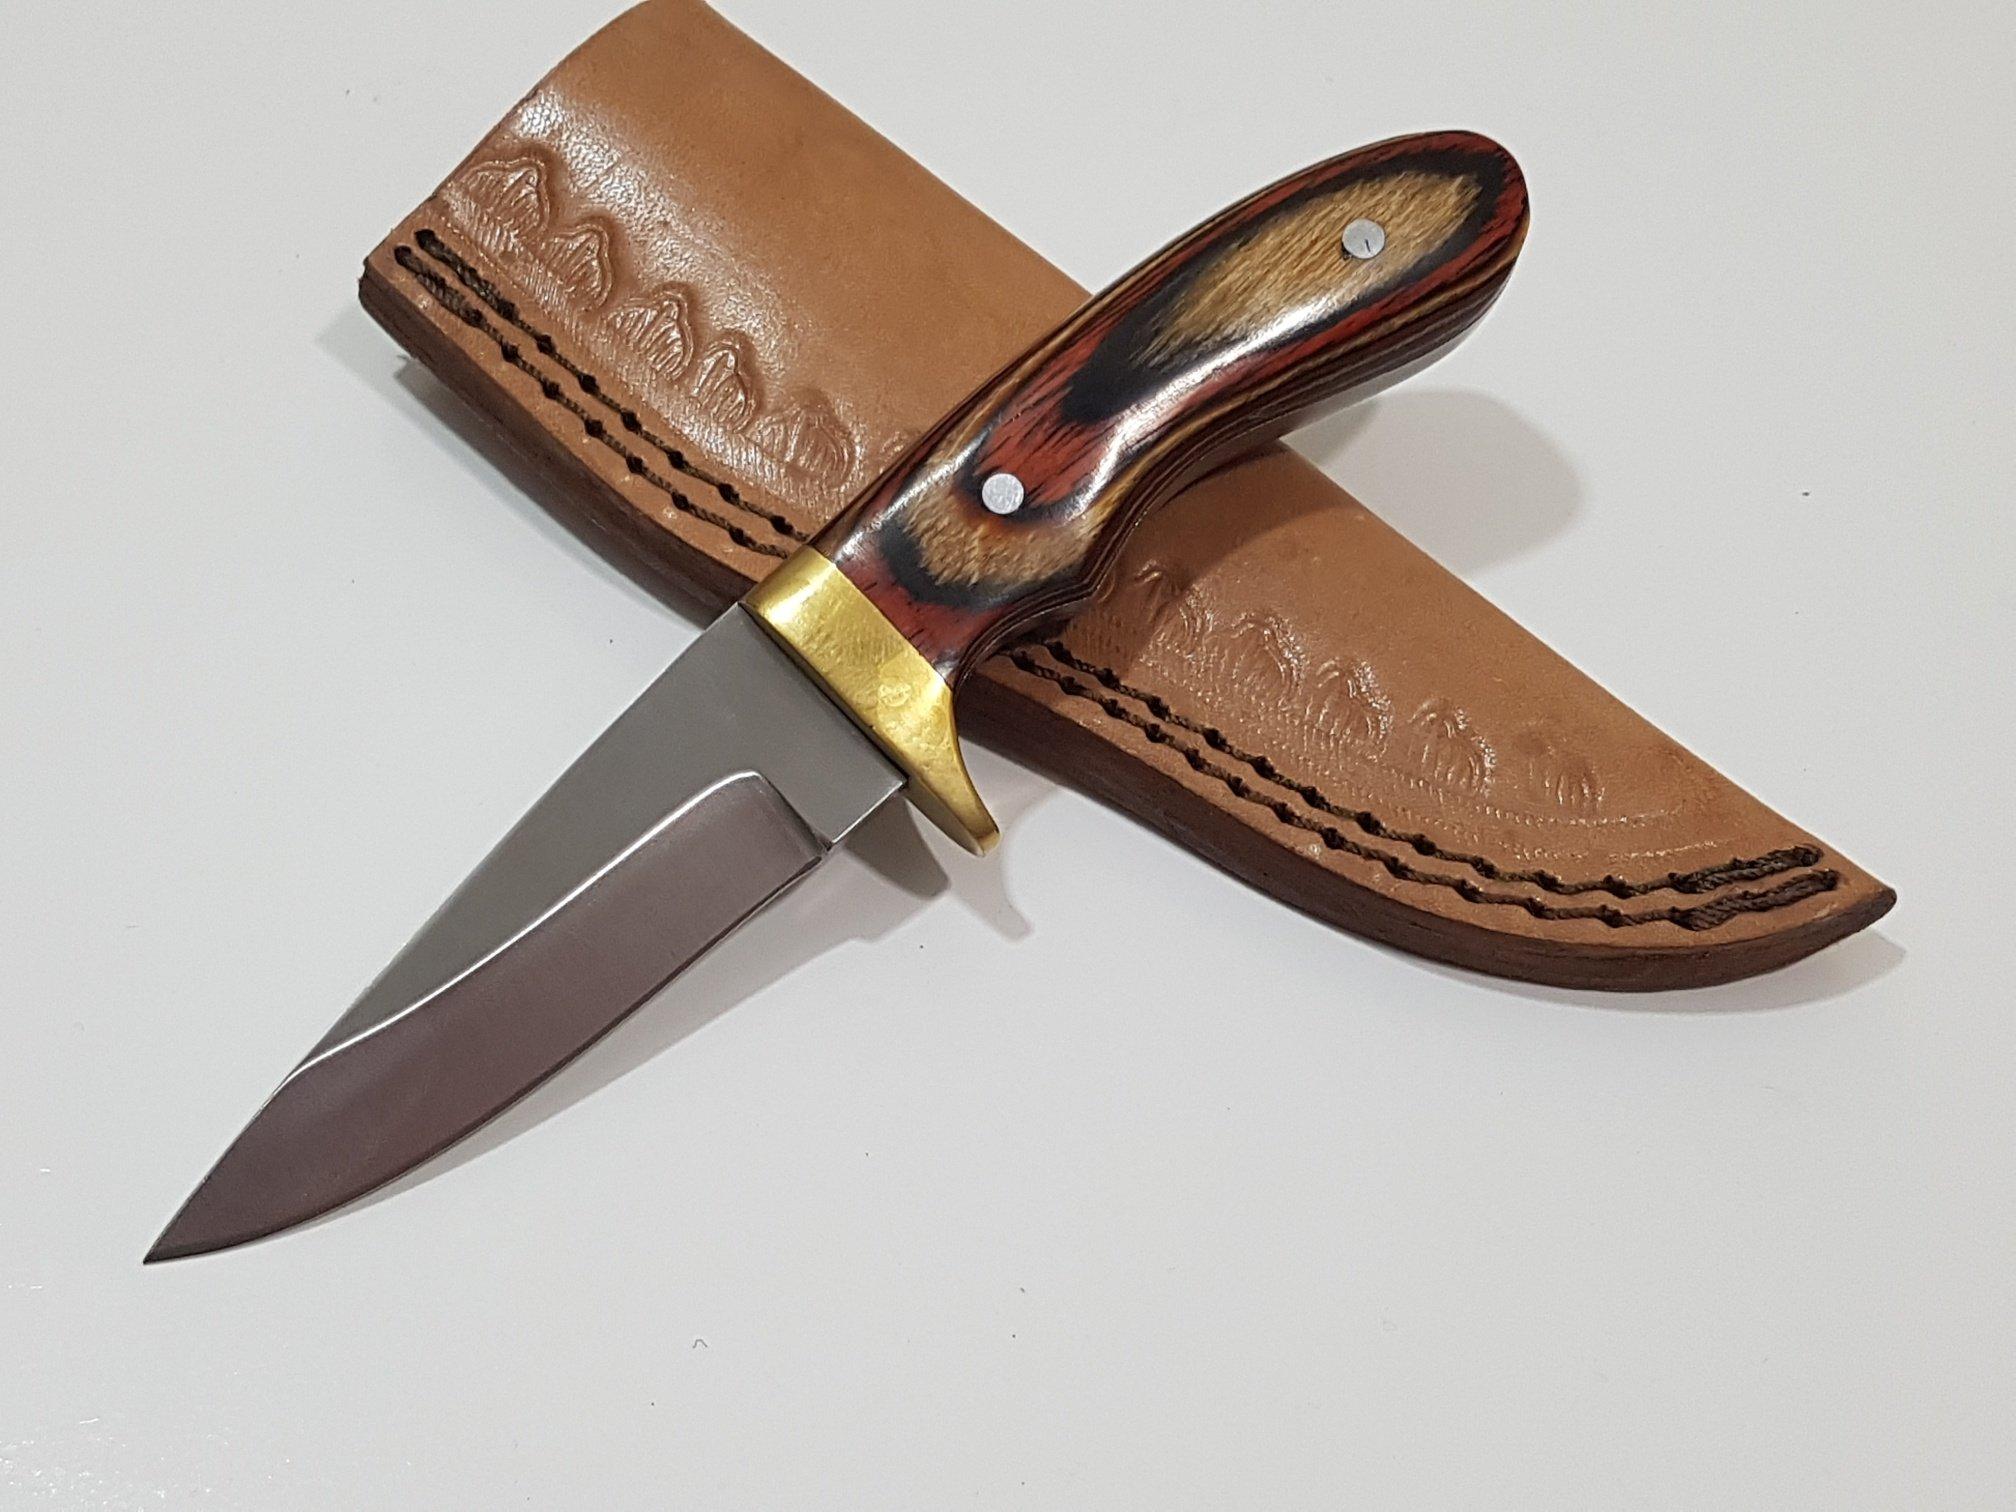 440C Steel FB-35 Custom Handmade Hunting Skinning Camping Knife, 6.5'' ( FULL TANG)